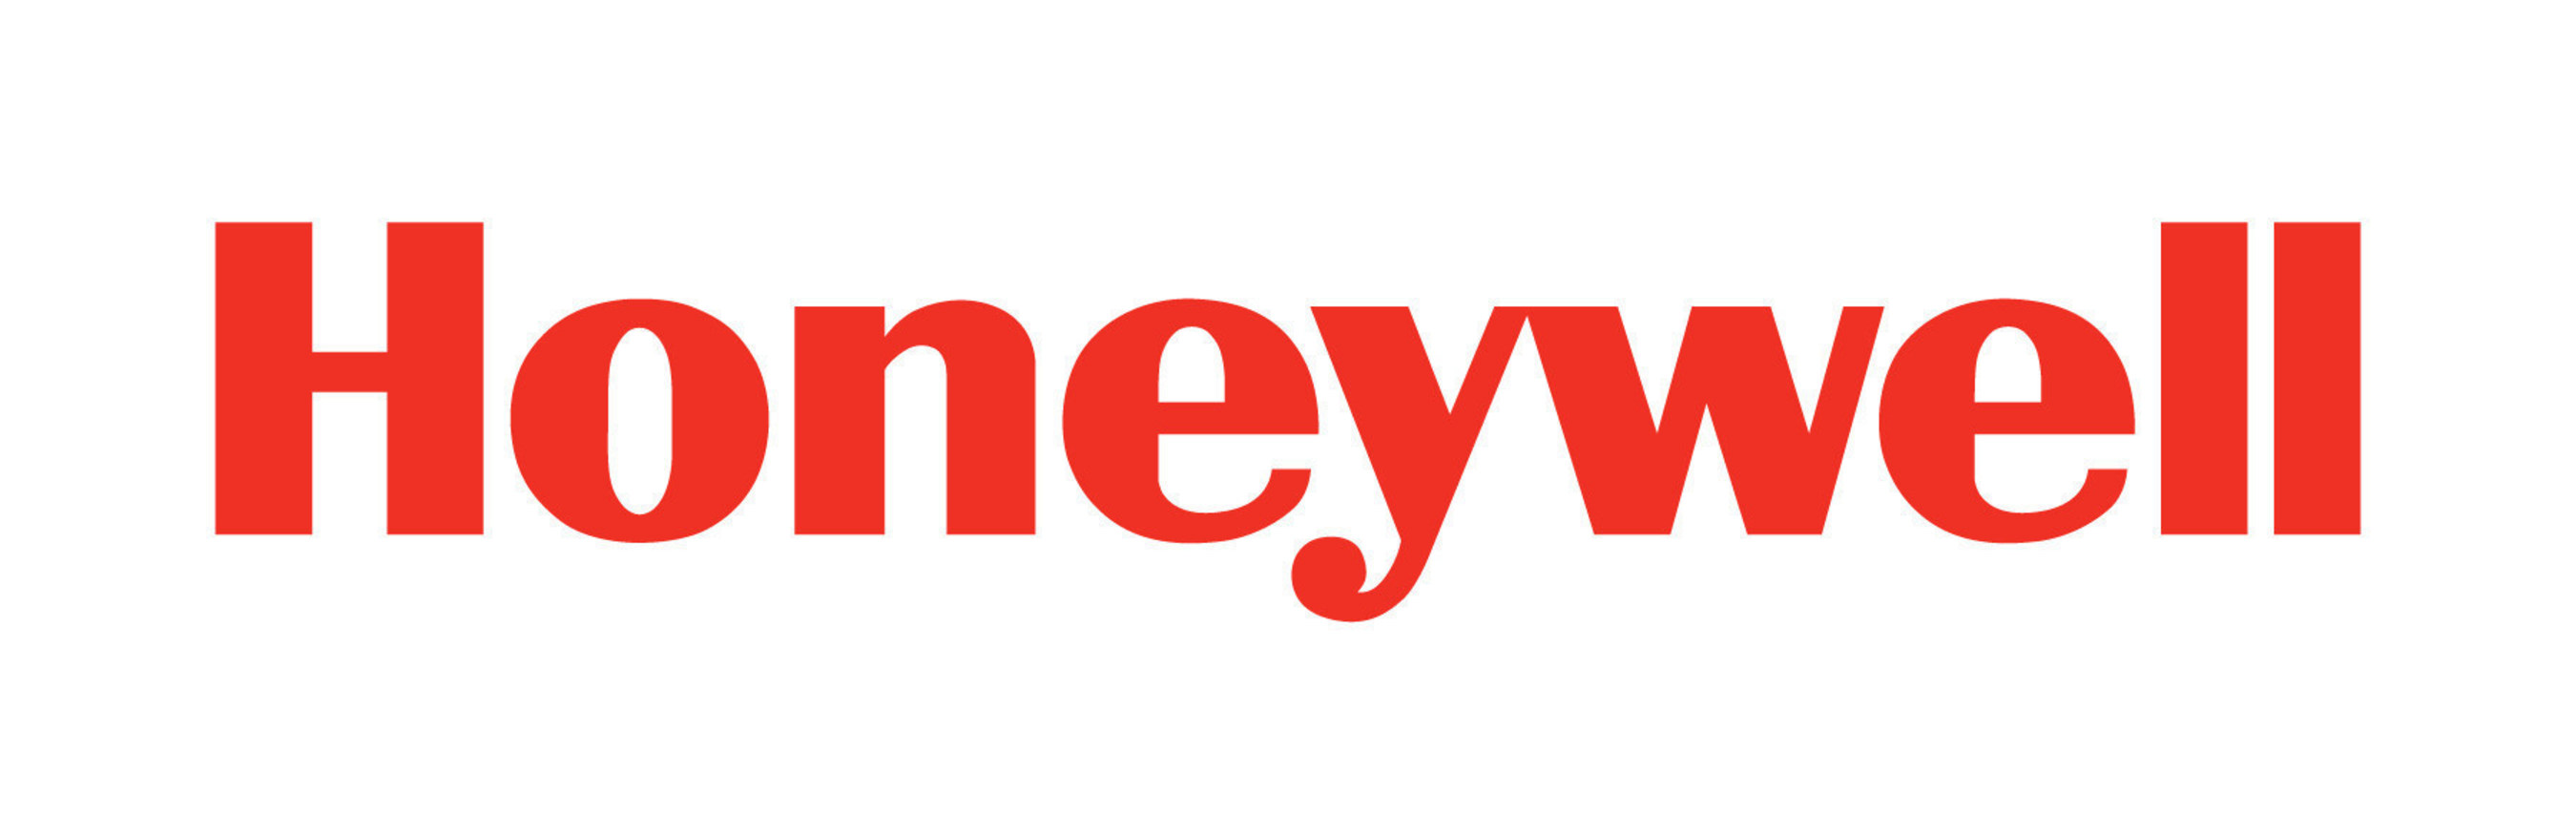 Honeywell Sensing and Productivity Solutions logo